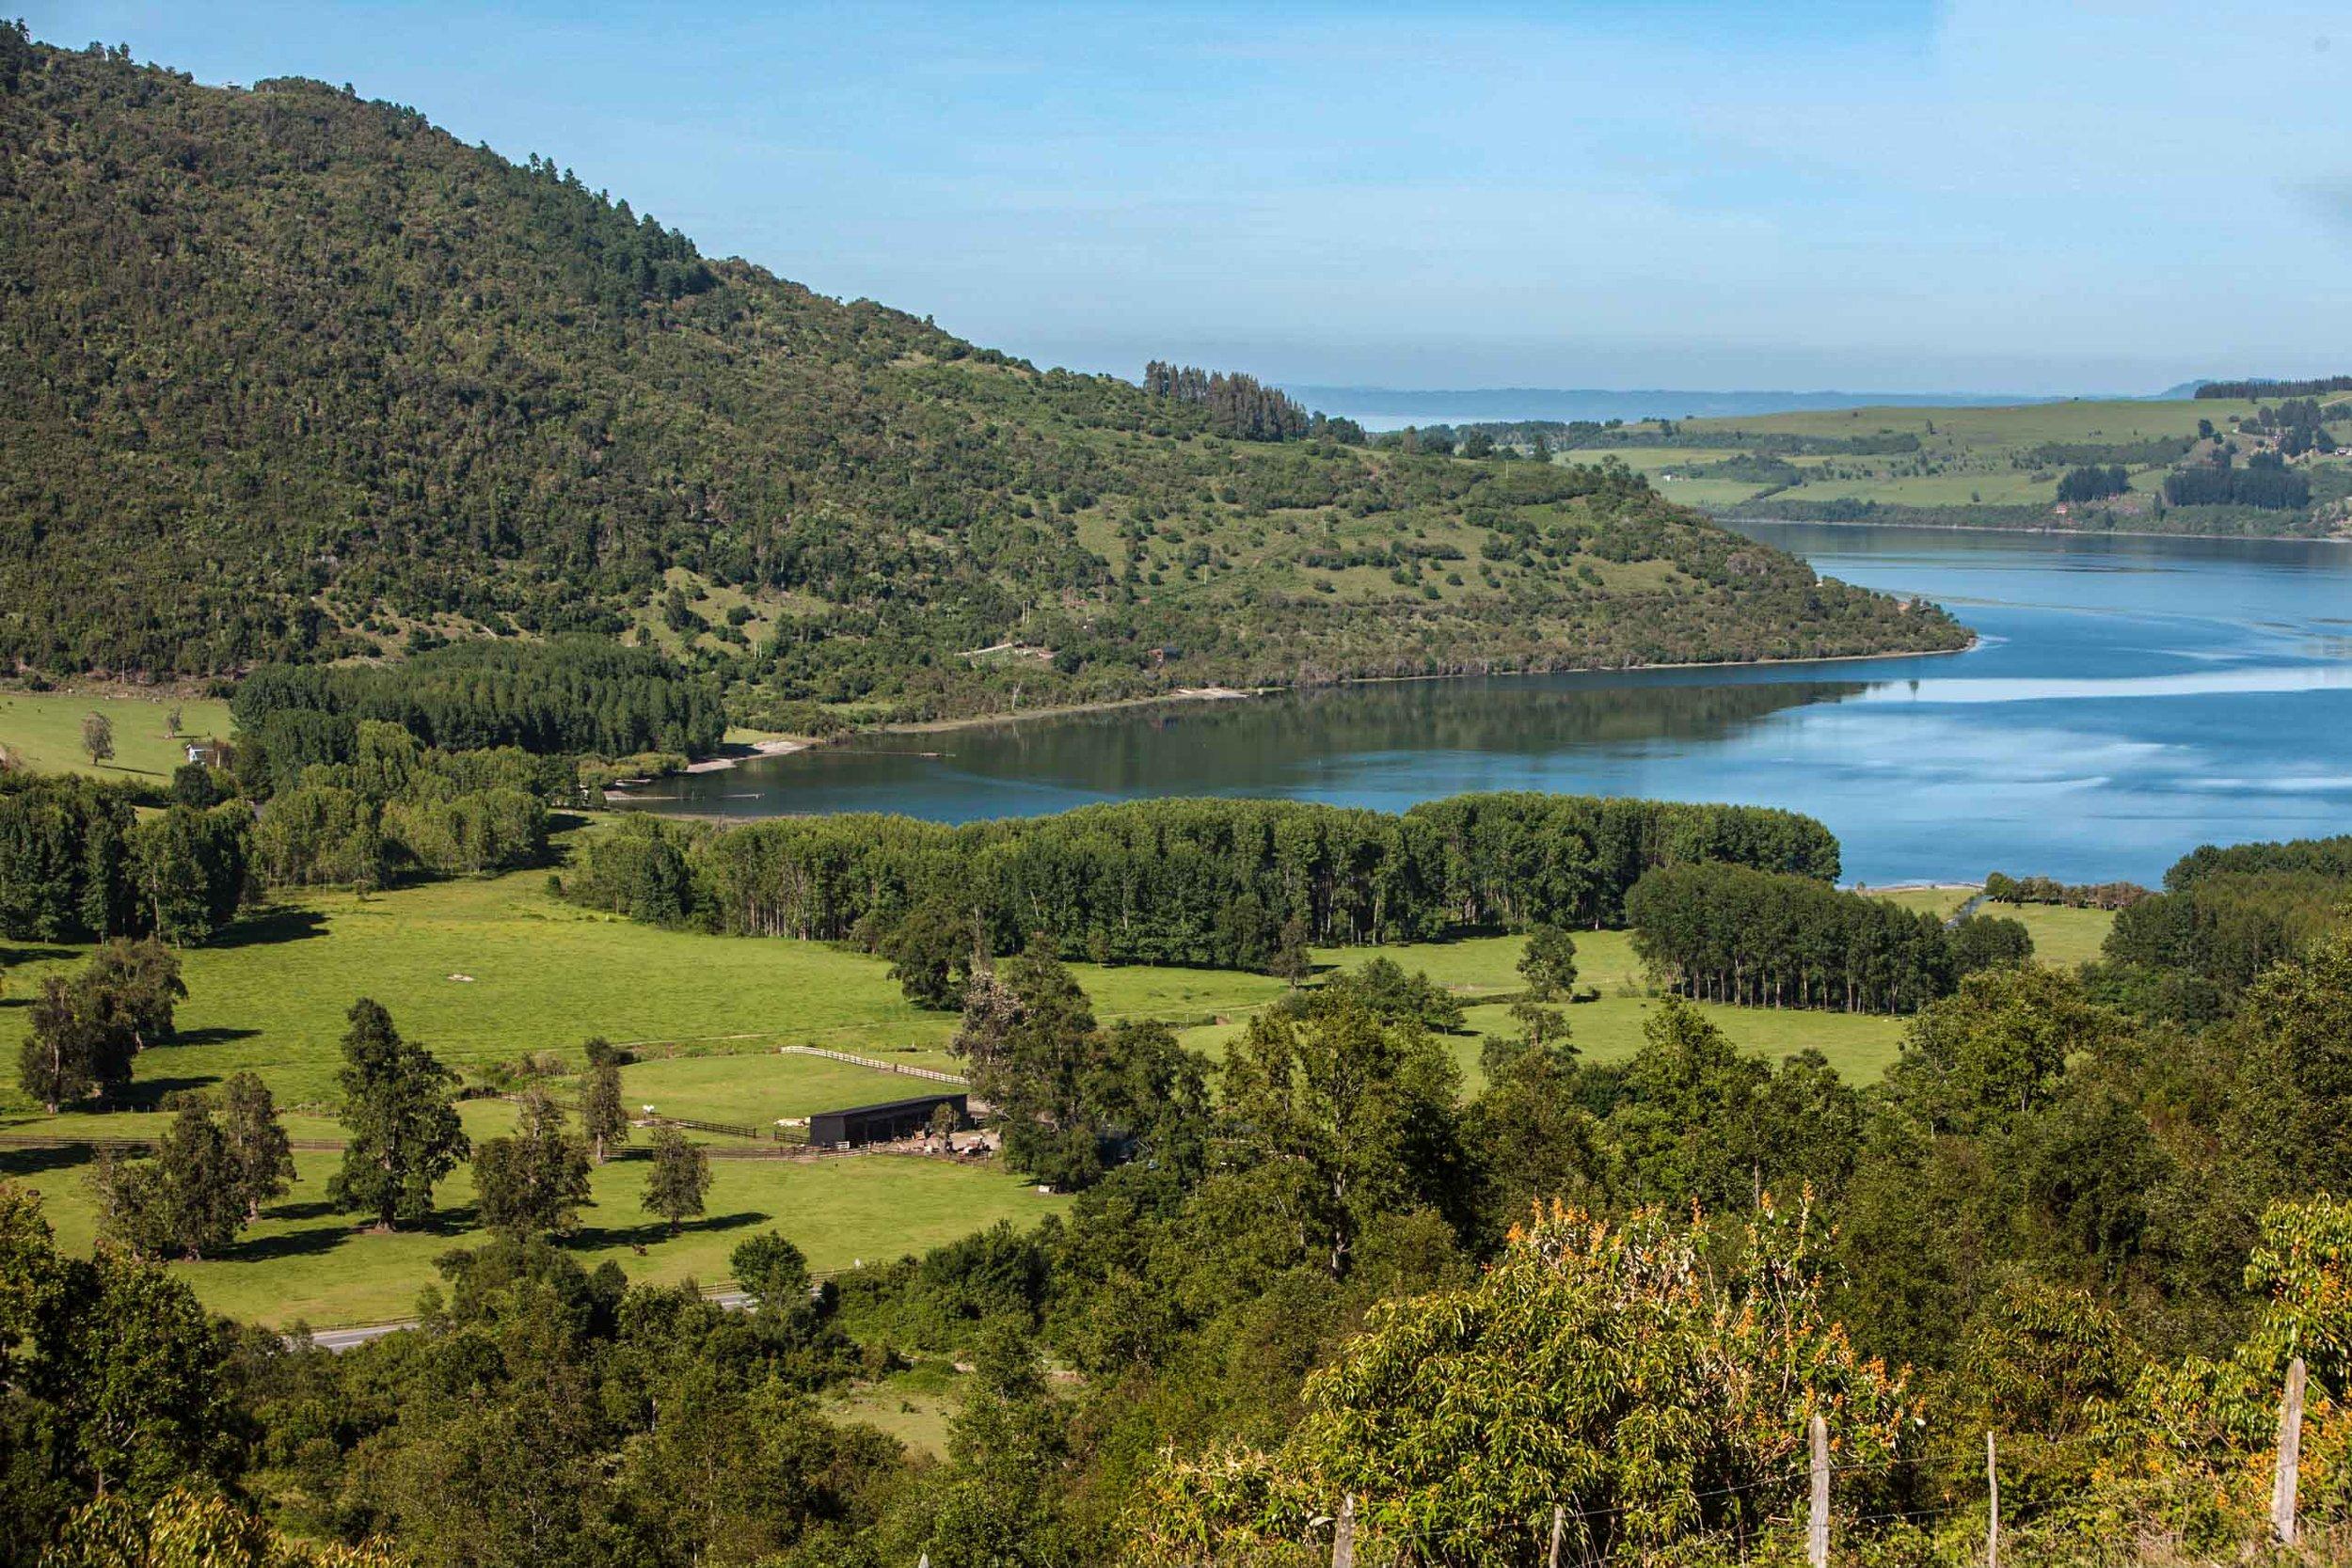 Lago Ranco vineyard, Casa Silva   ©John Szabo (published by Jacqui Small)